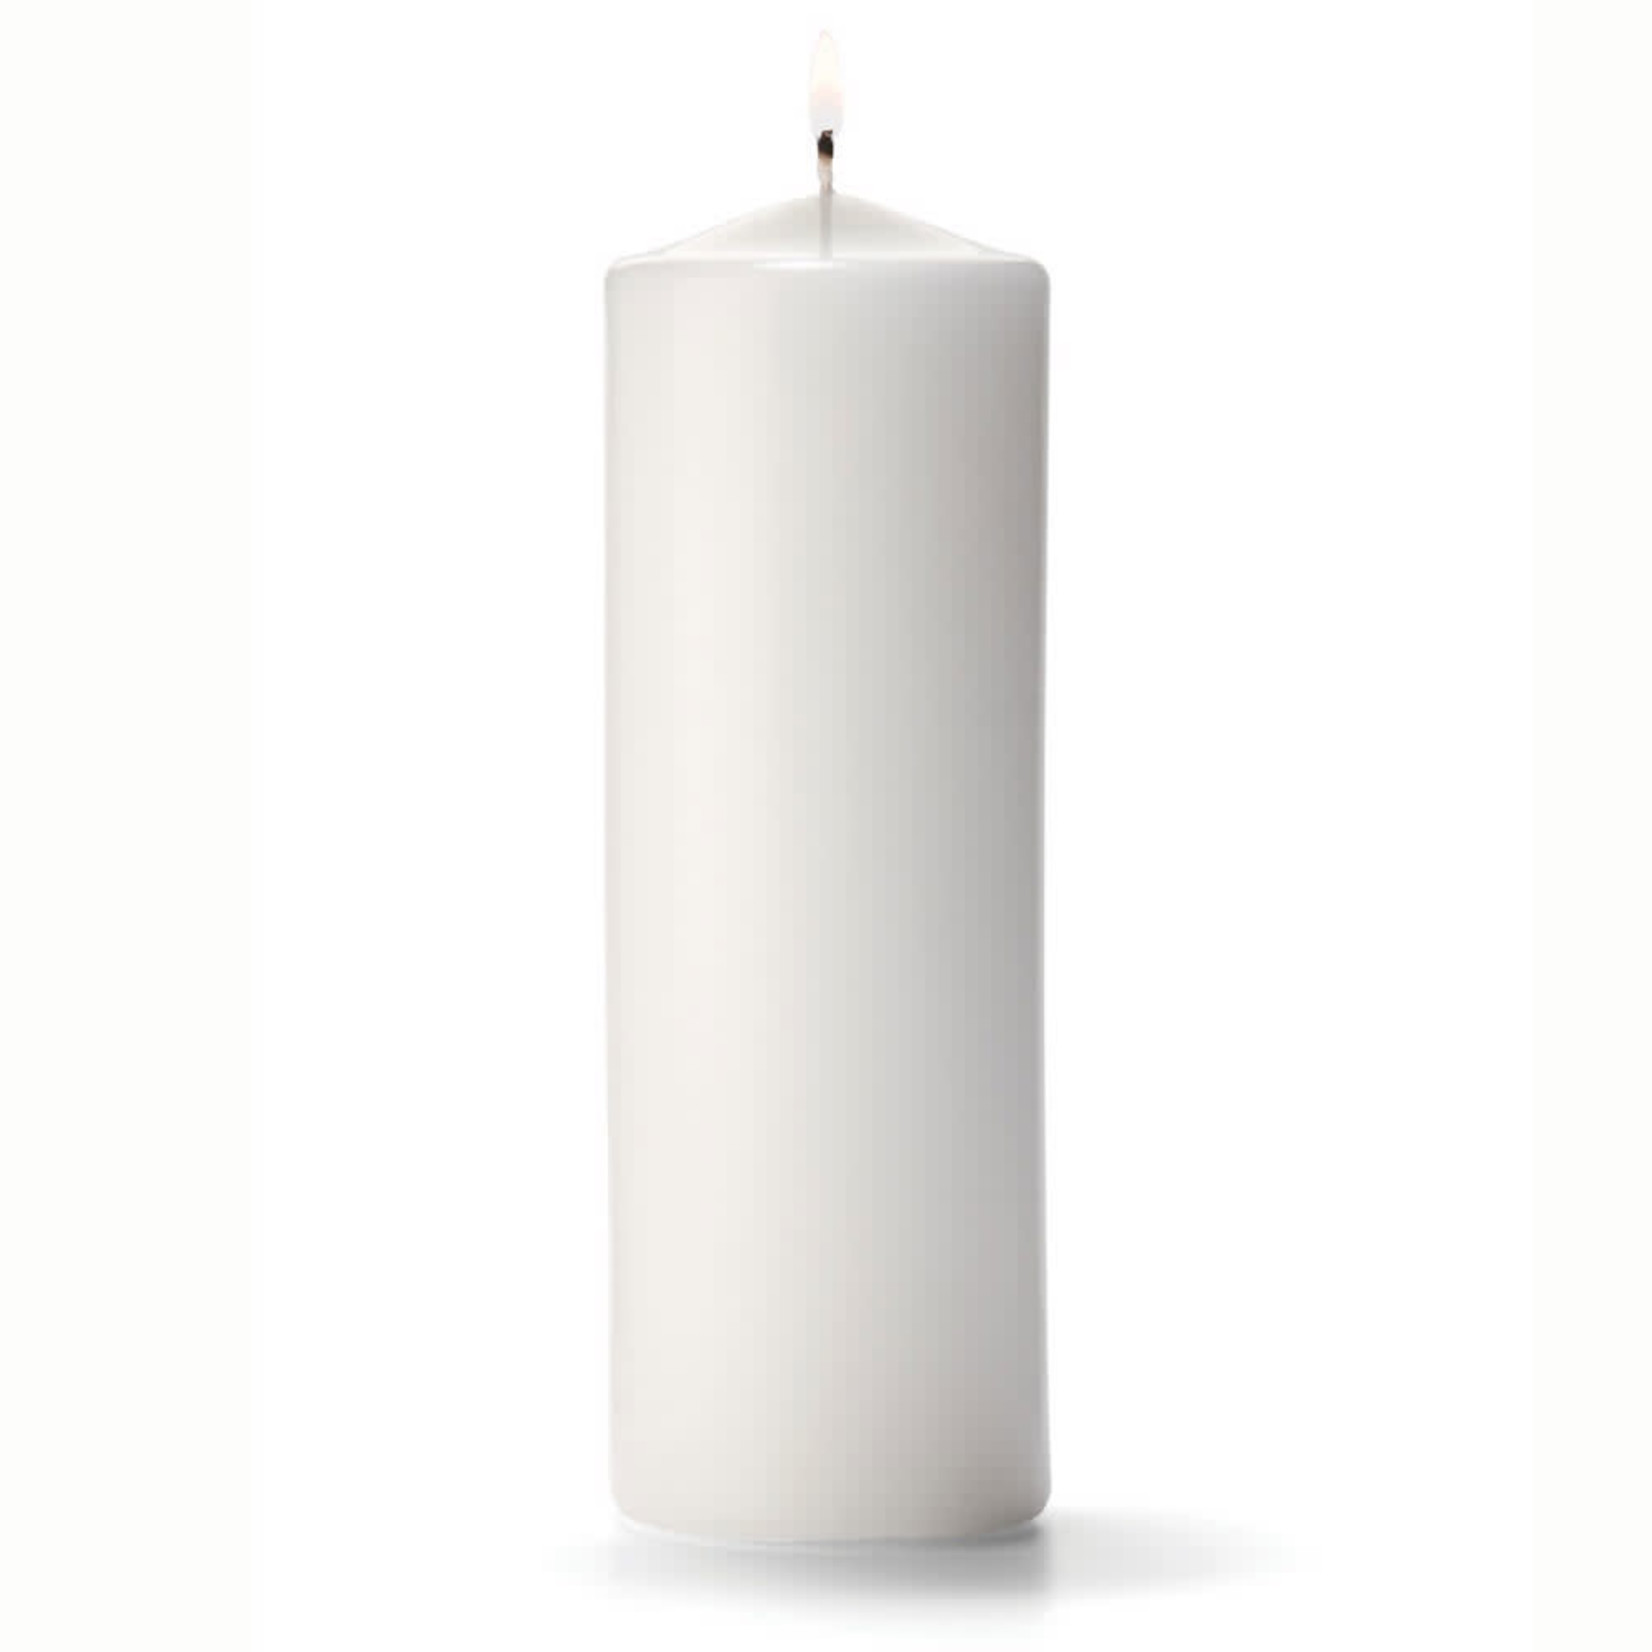 "3""""X16""""H, WHITE Round Pillar Candle"